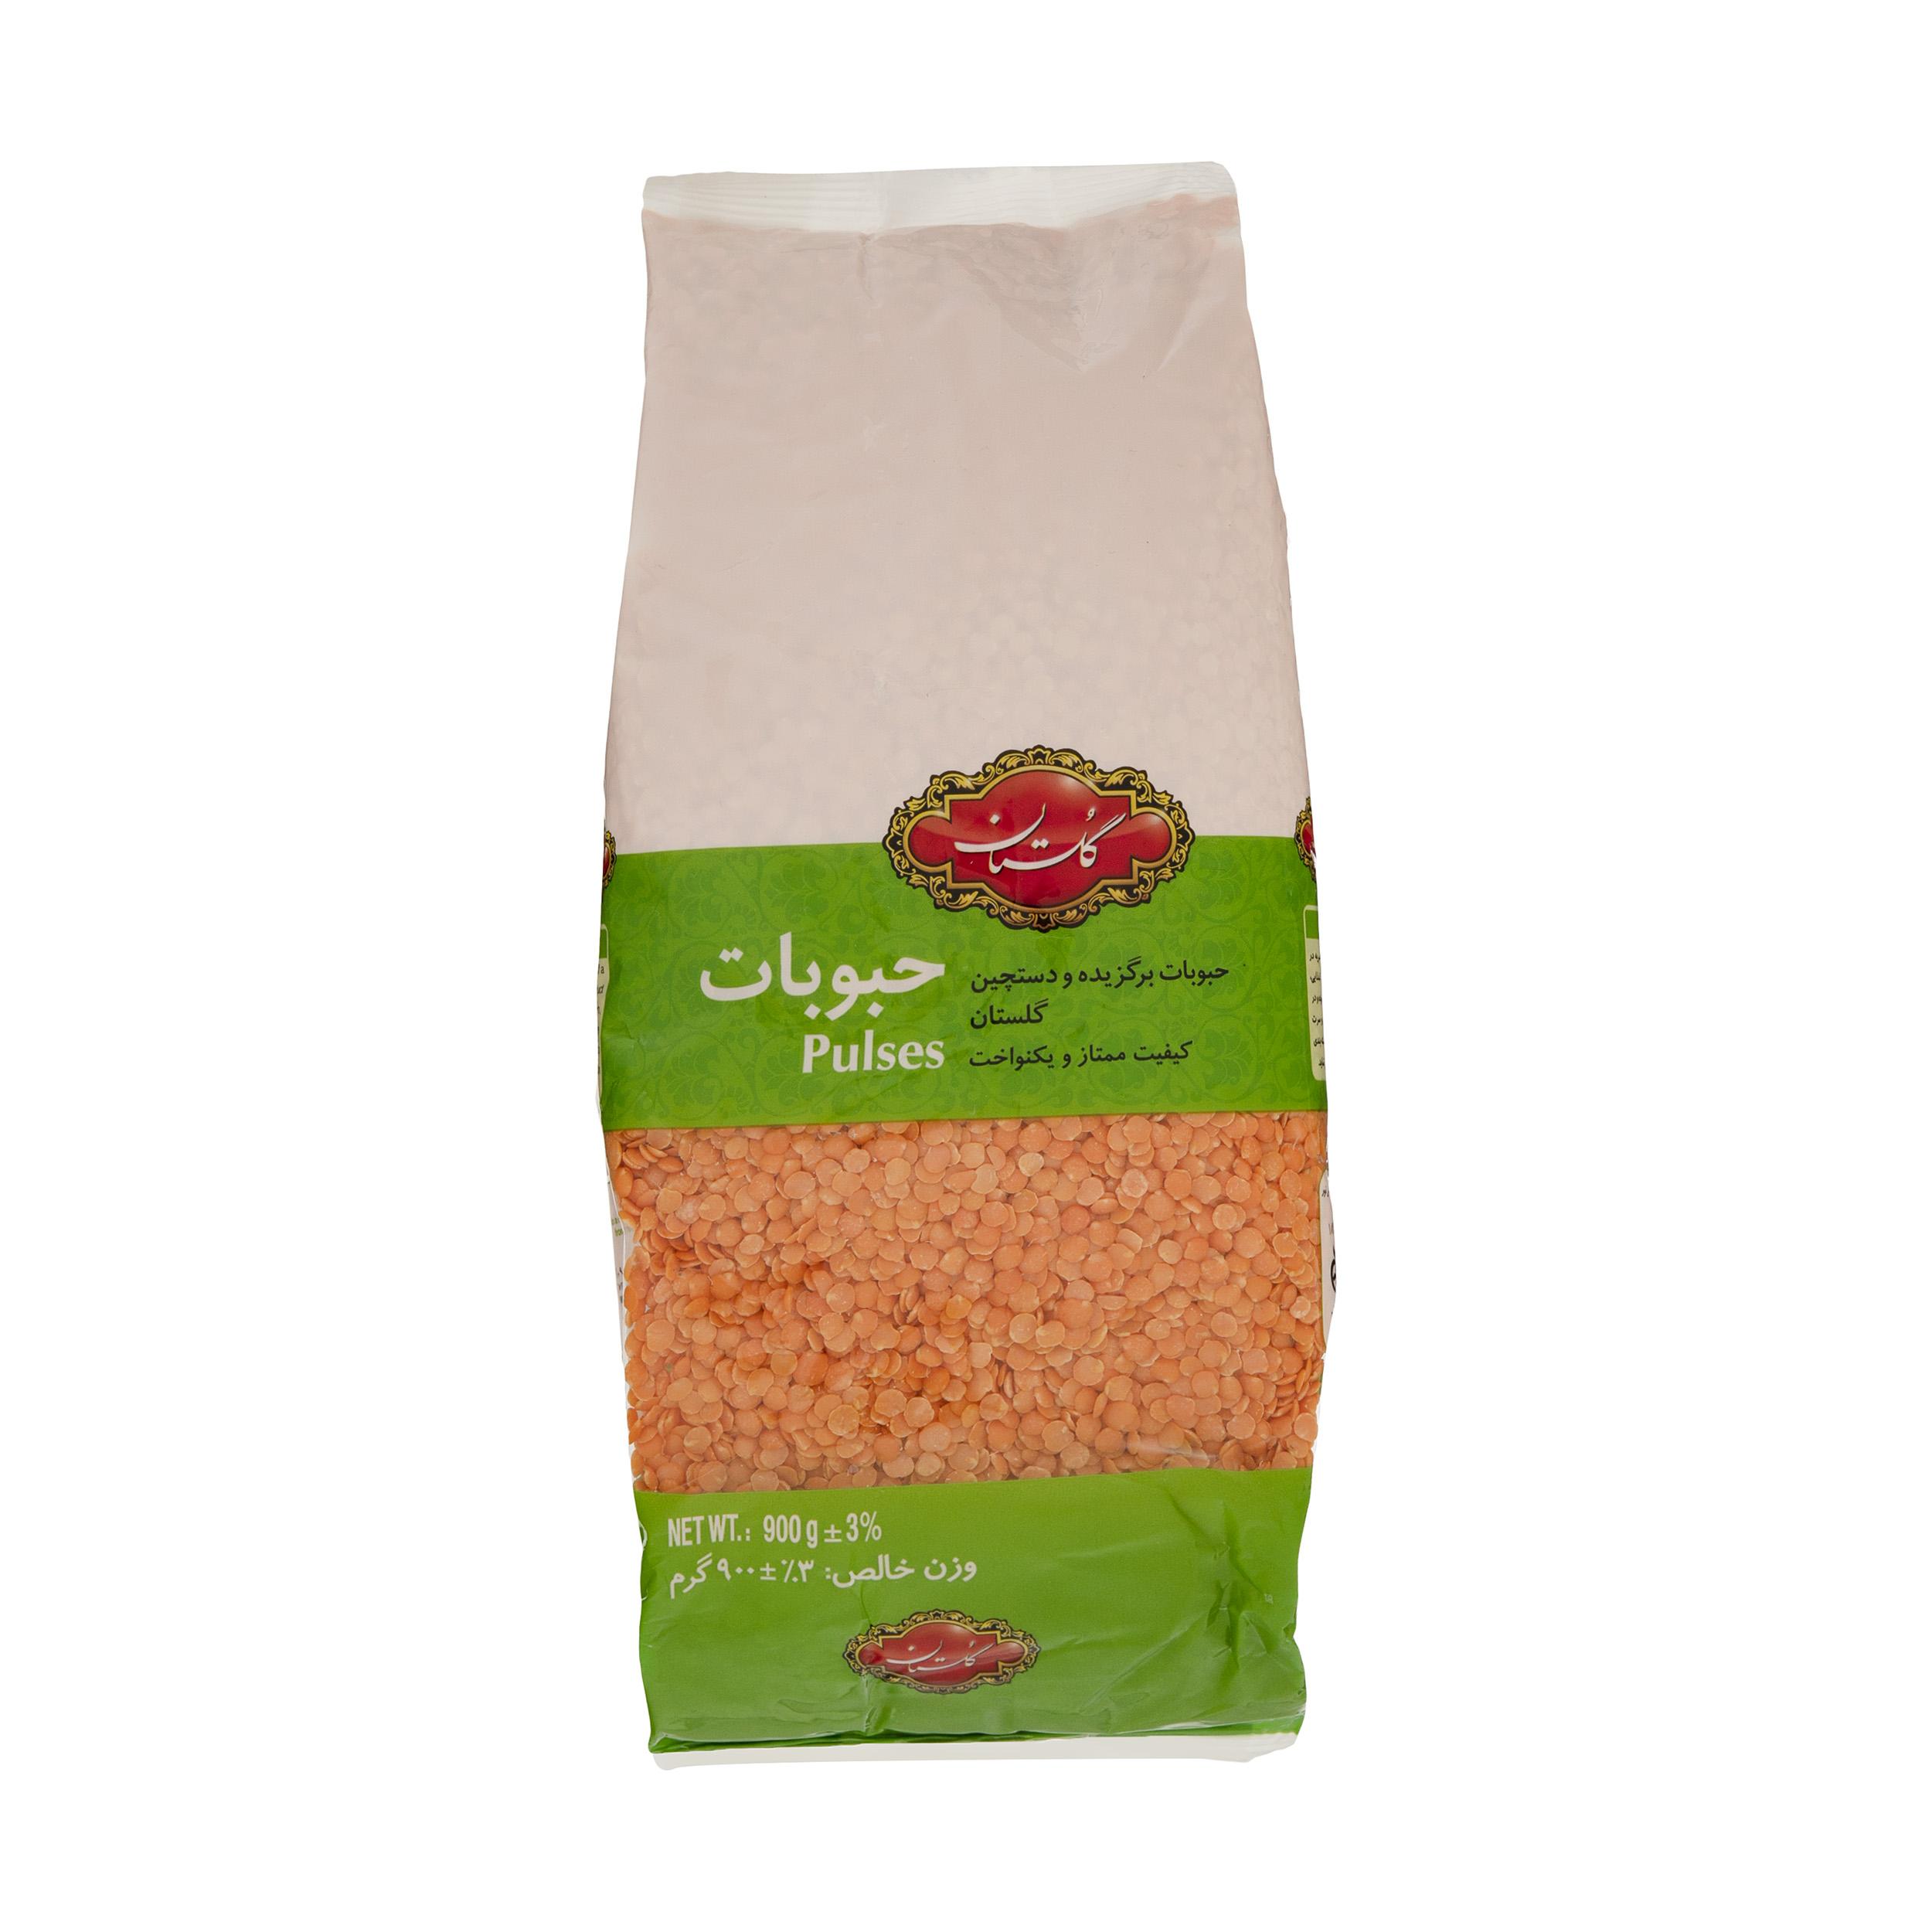 Golestan lentils- 900 grams